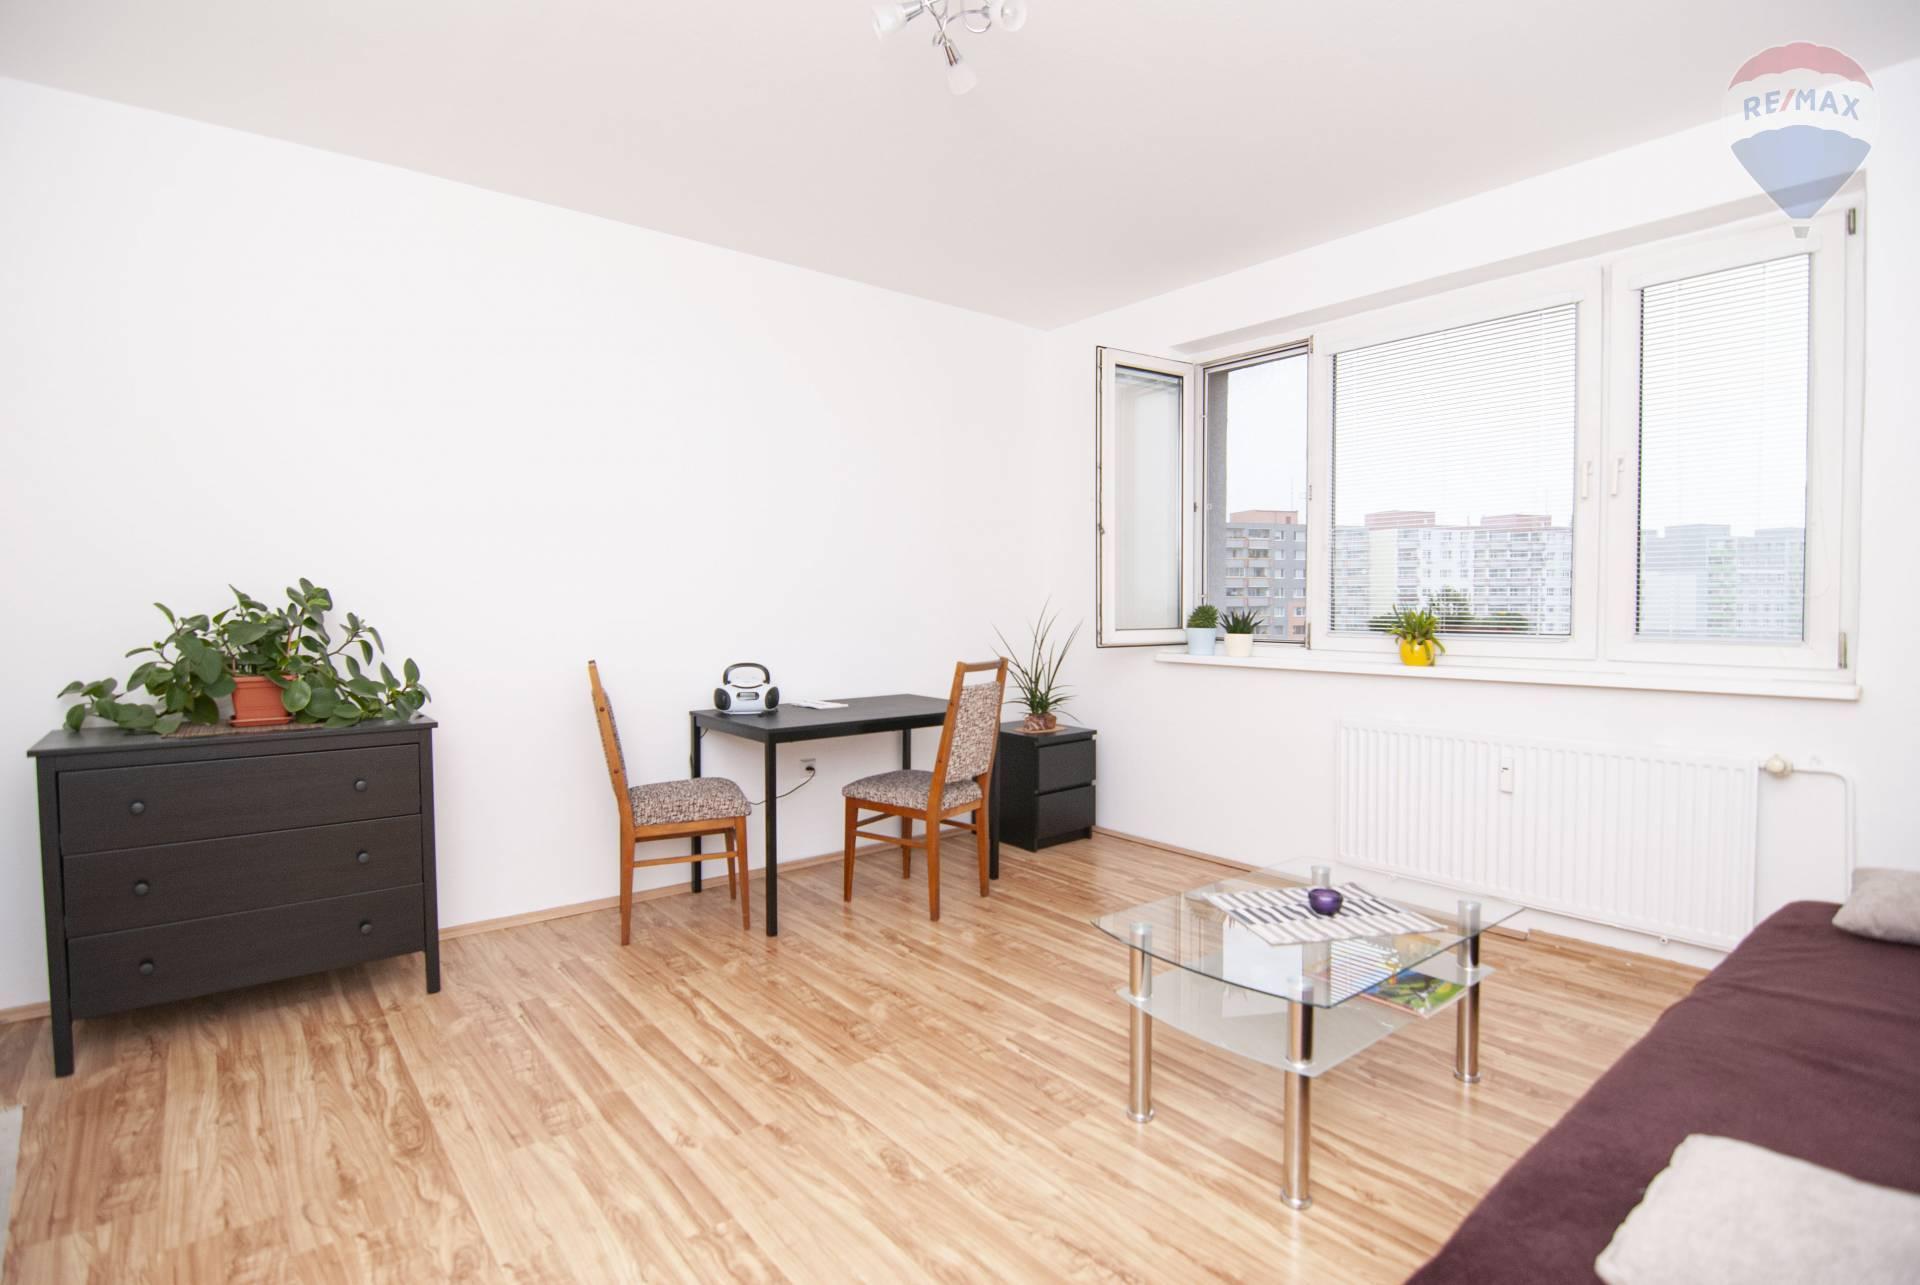 Predaj bytu (2 izbový) 47 m2, Bratislava - Ružinov -